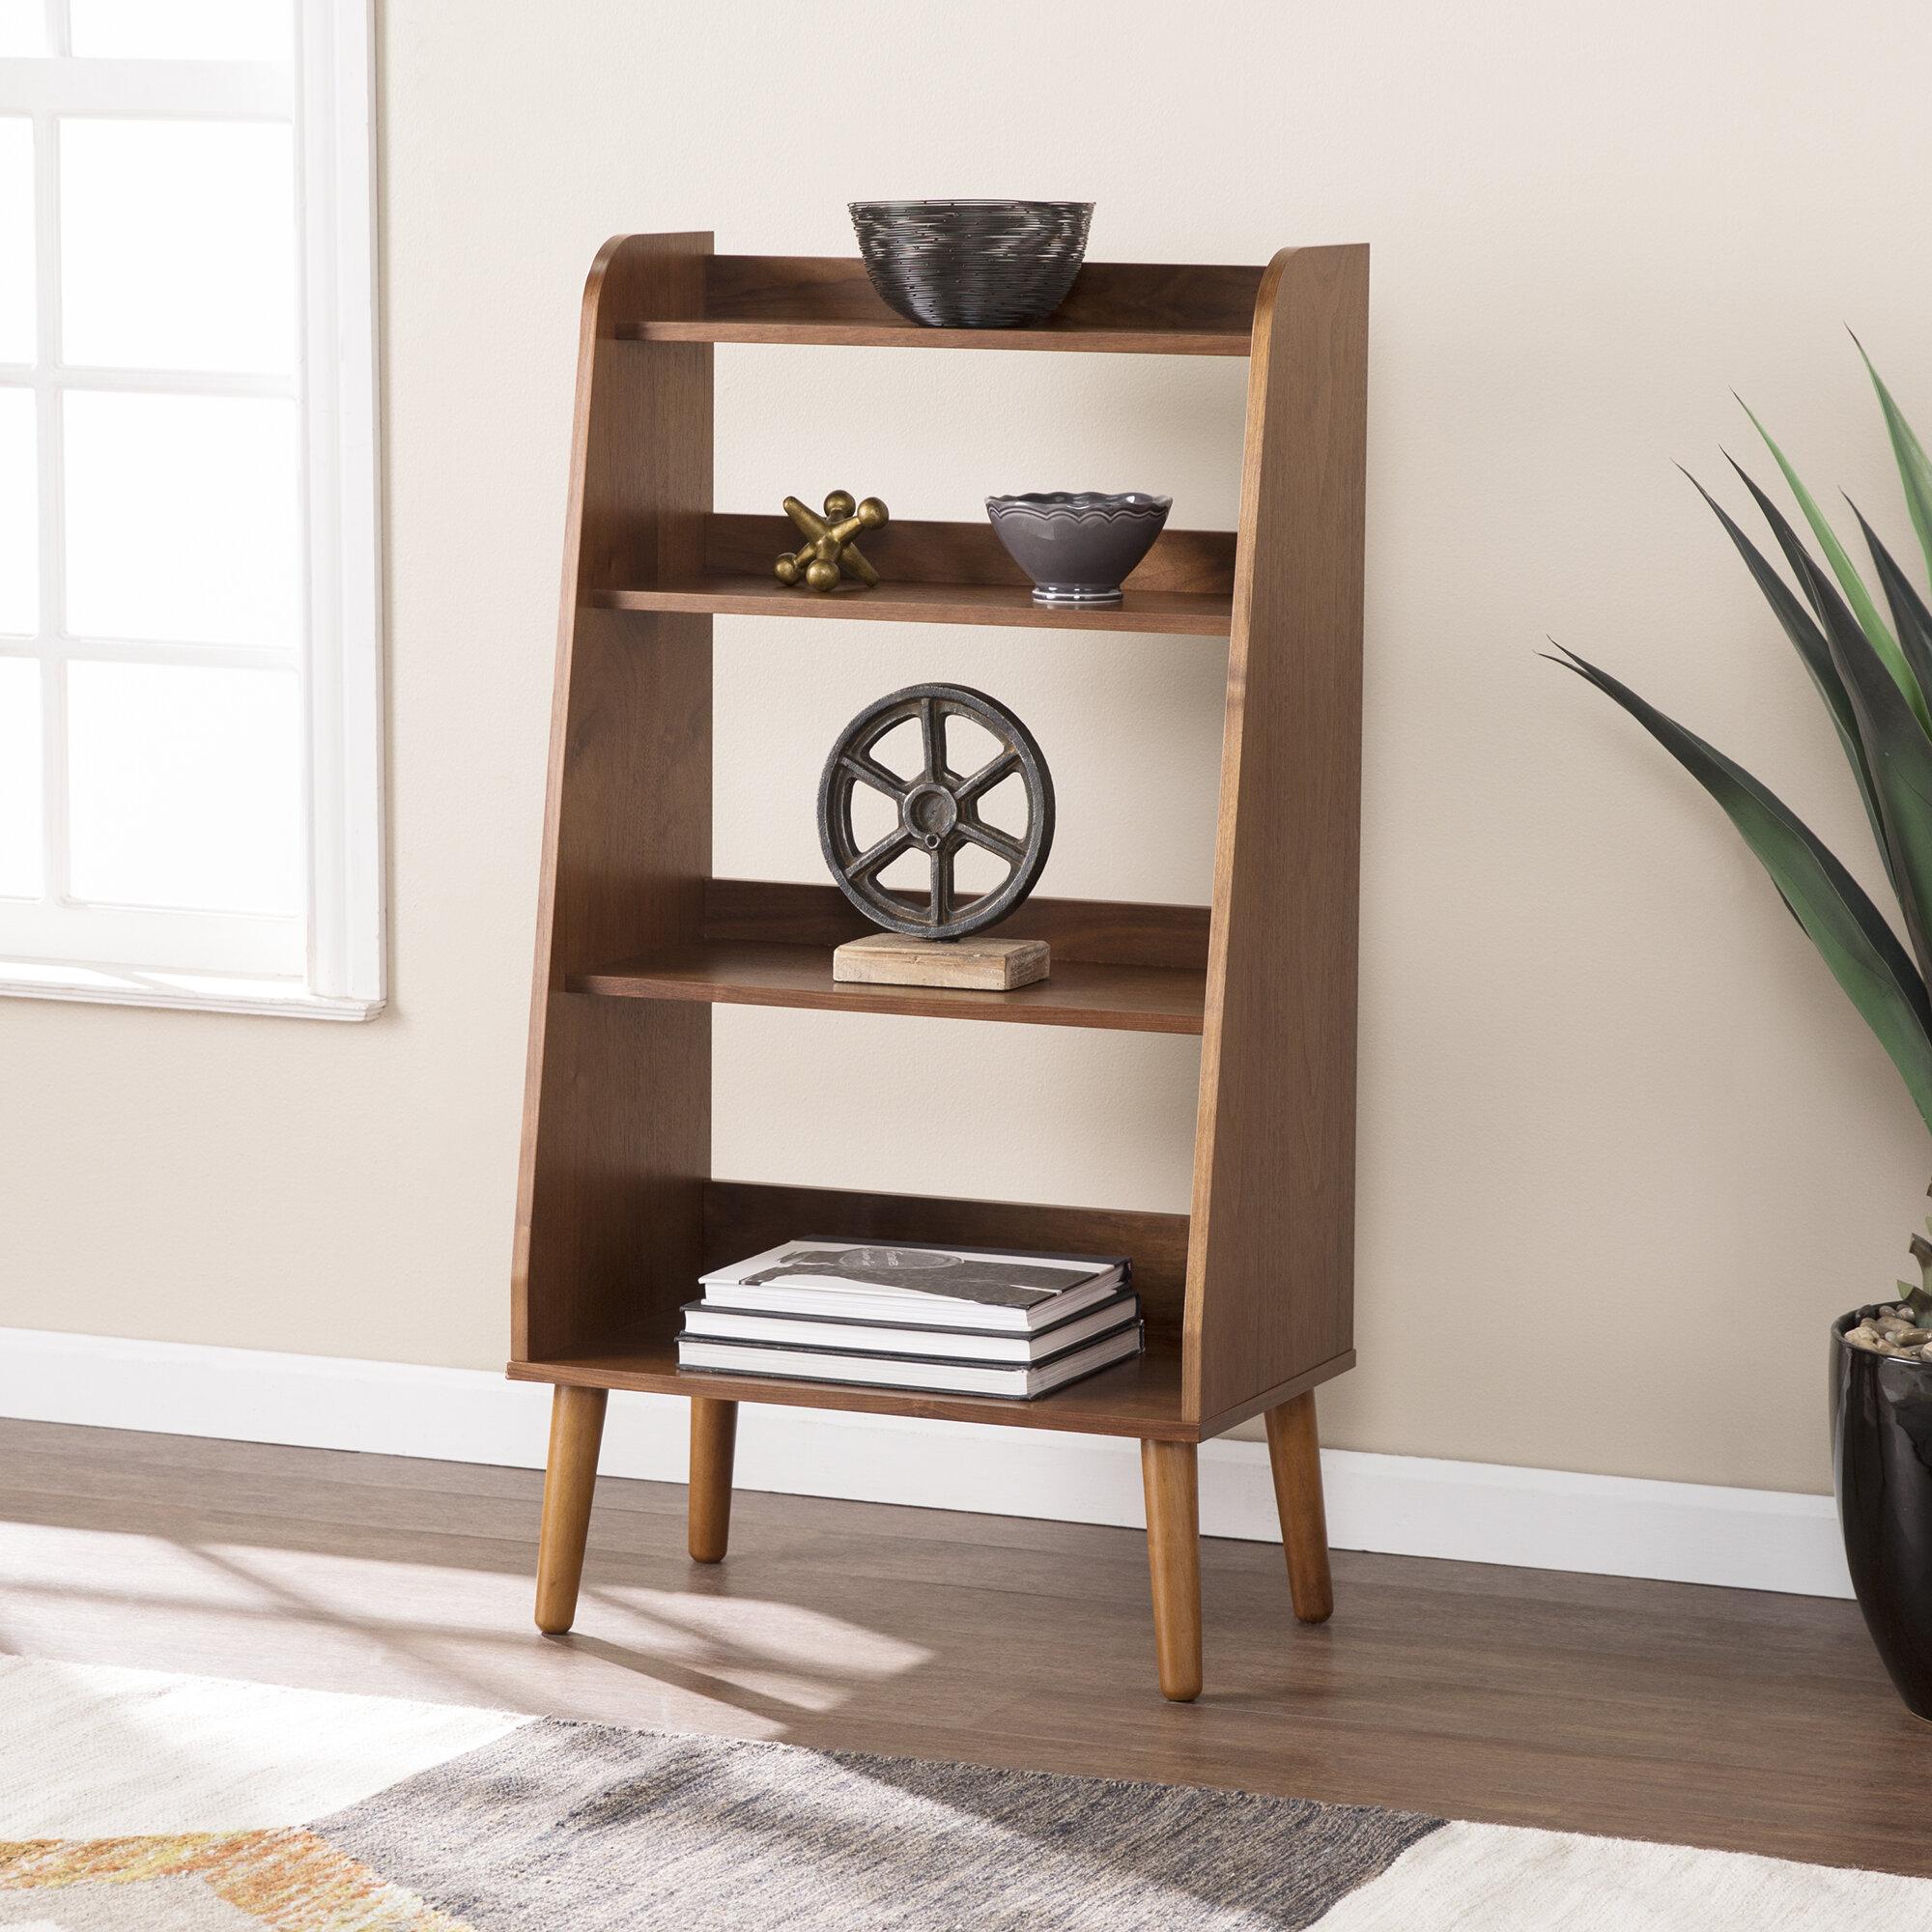 Image of: Corrigan Studio Bracken Midcentury Modern Ladder Bookcase Reviews Wayfair